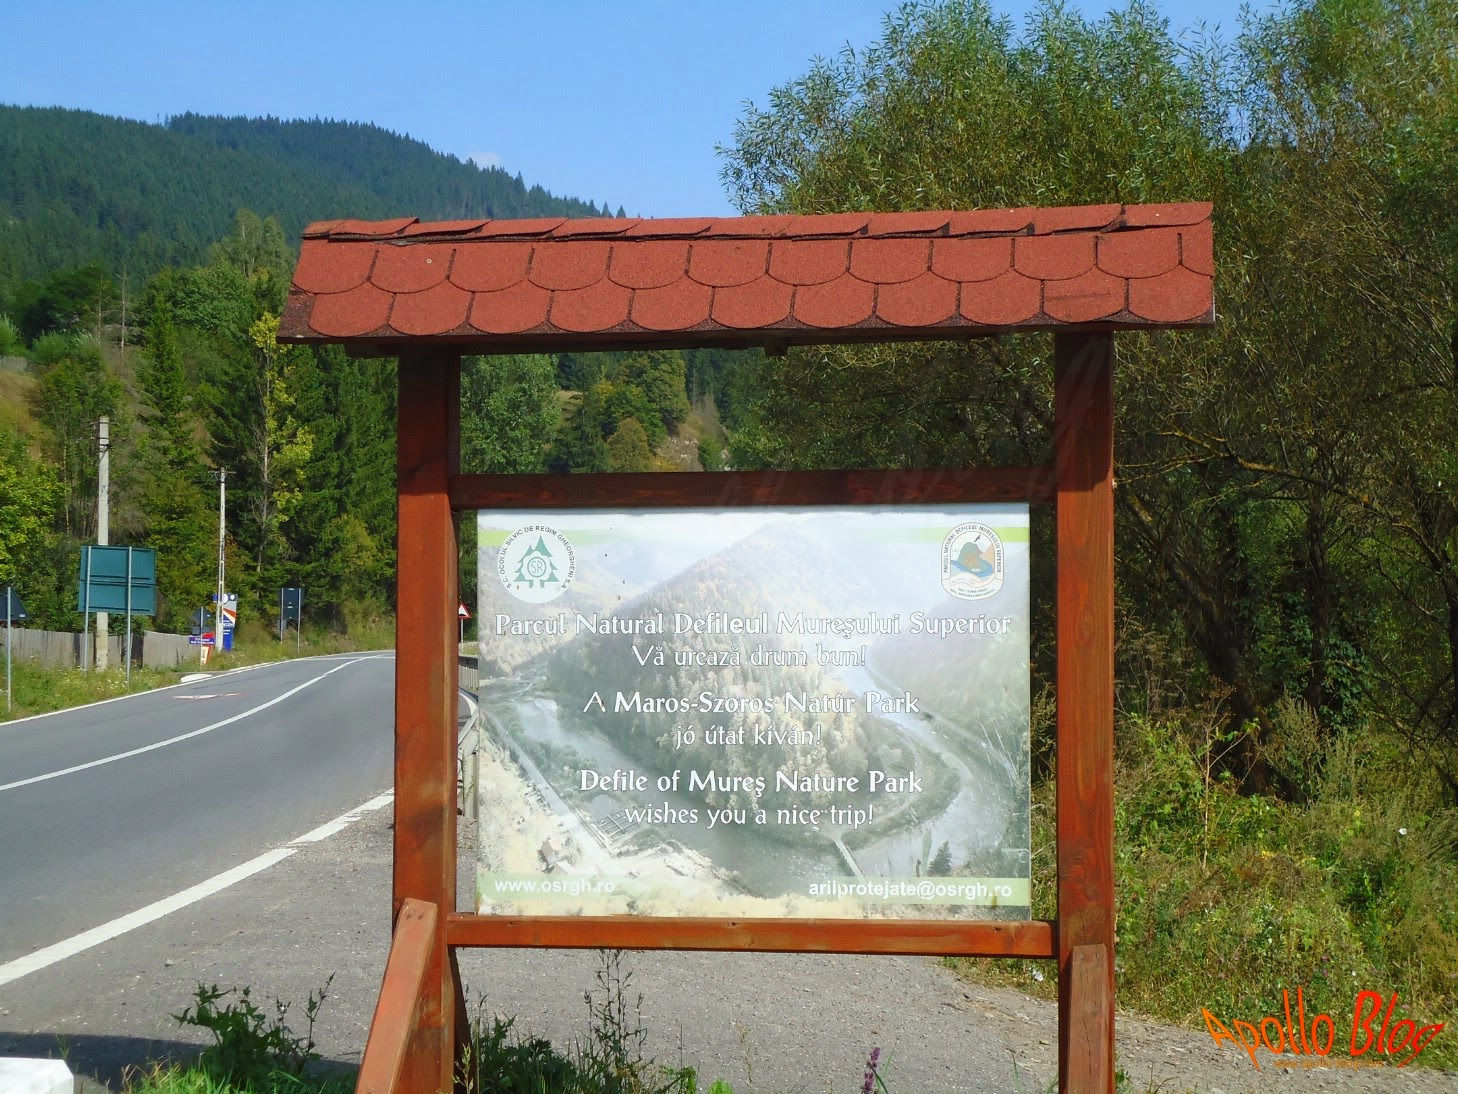 Parcul Natural